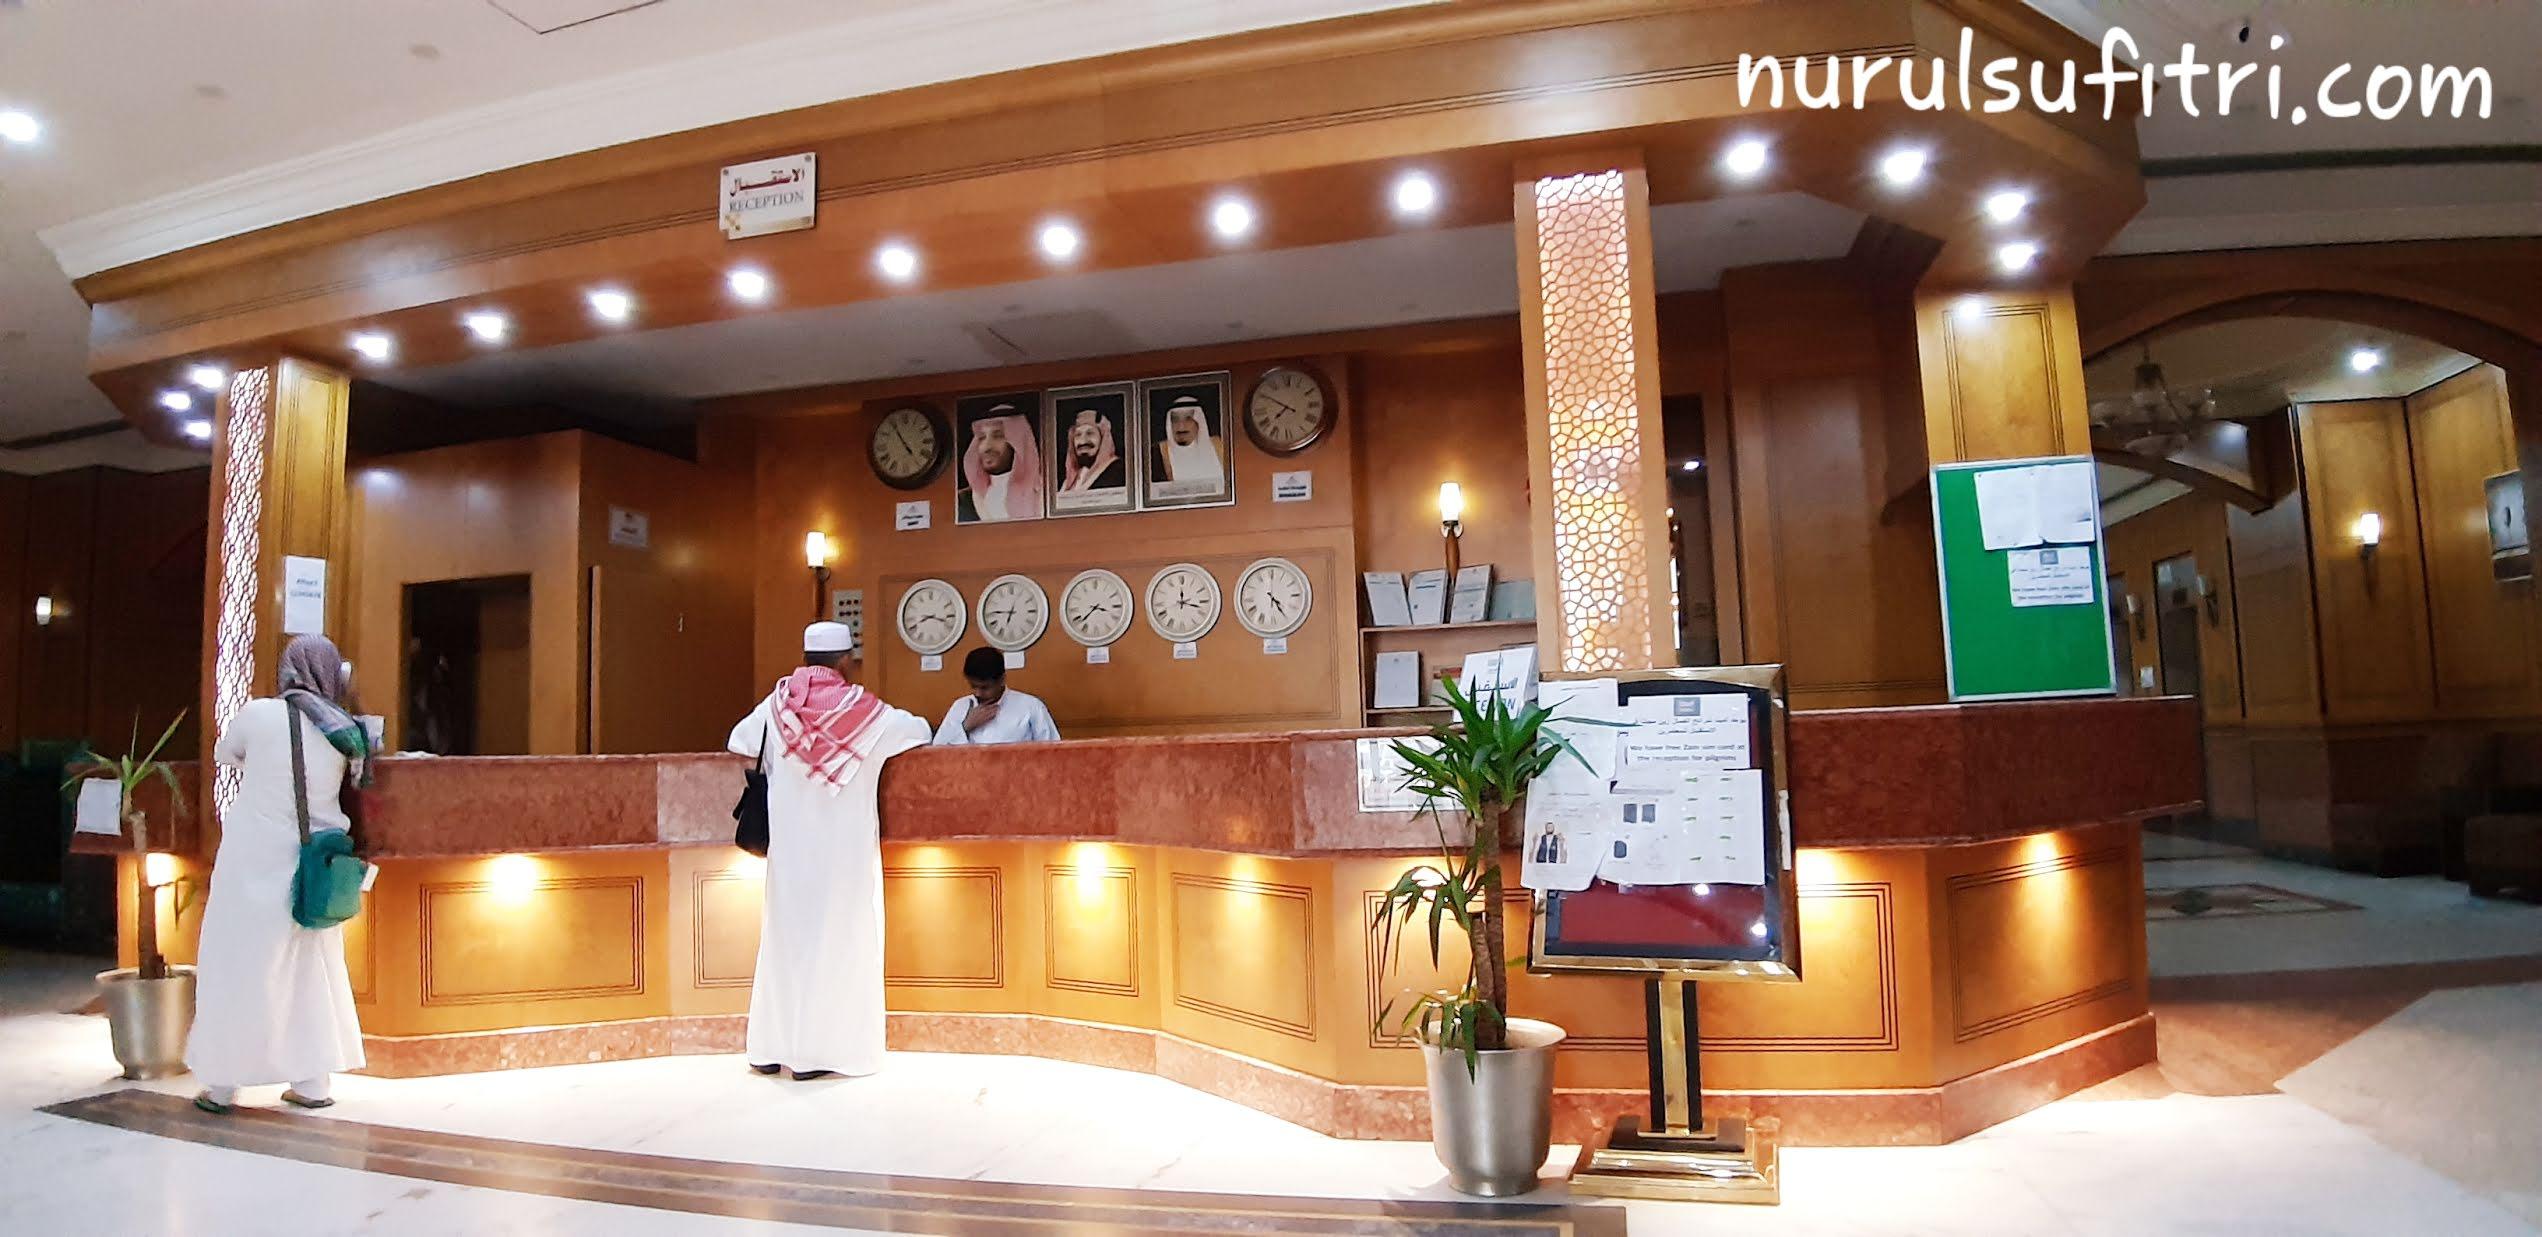 pengalaman menginap di hotel al olayan a; khalil makkah ketika umroh review traveling nurul sufitri lifestyle blogger arab saudi